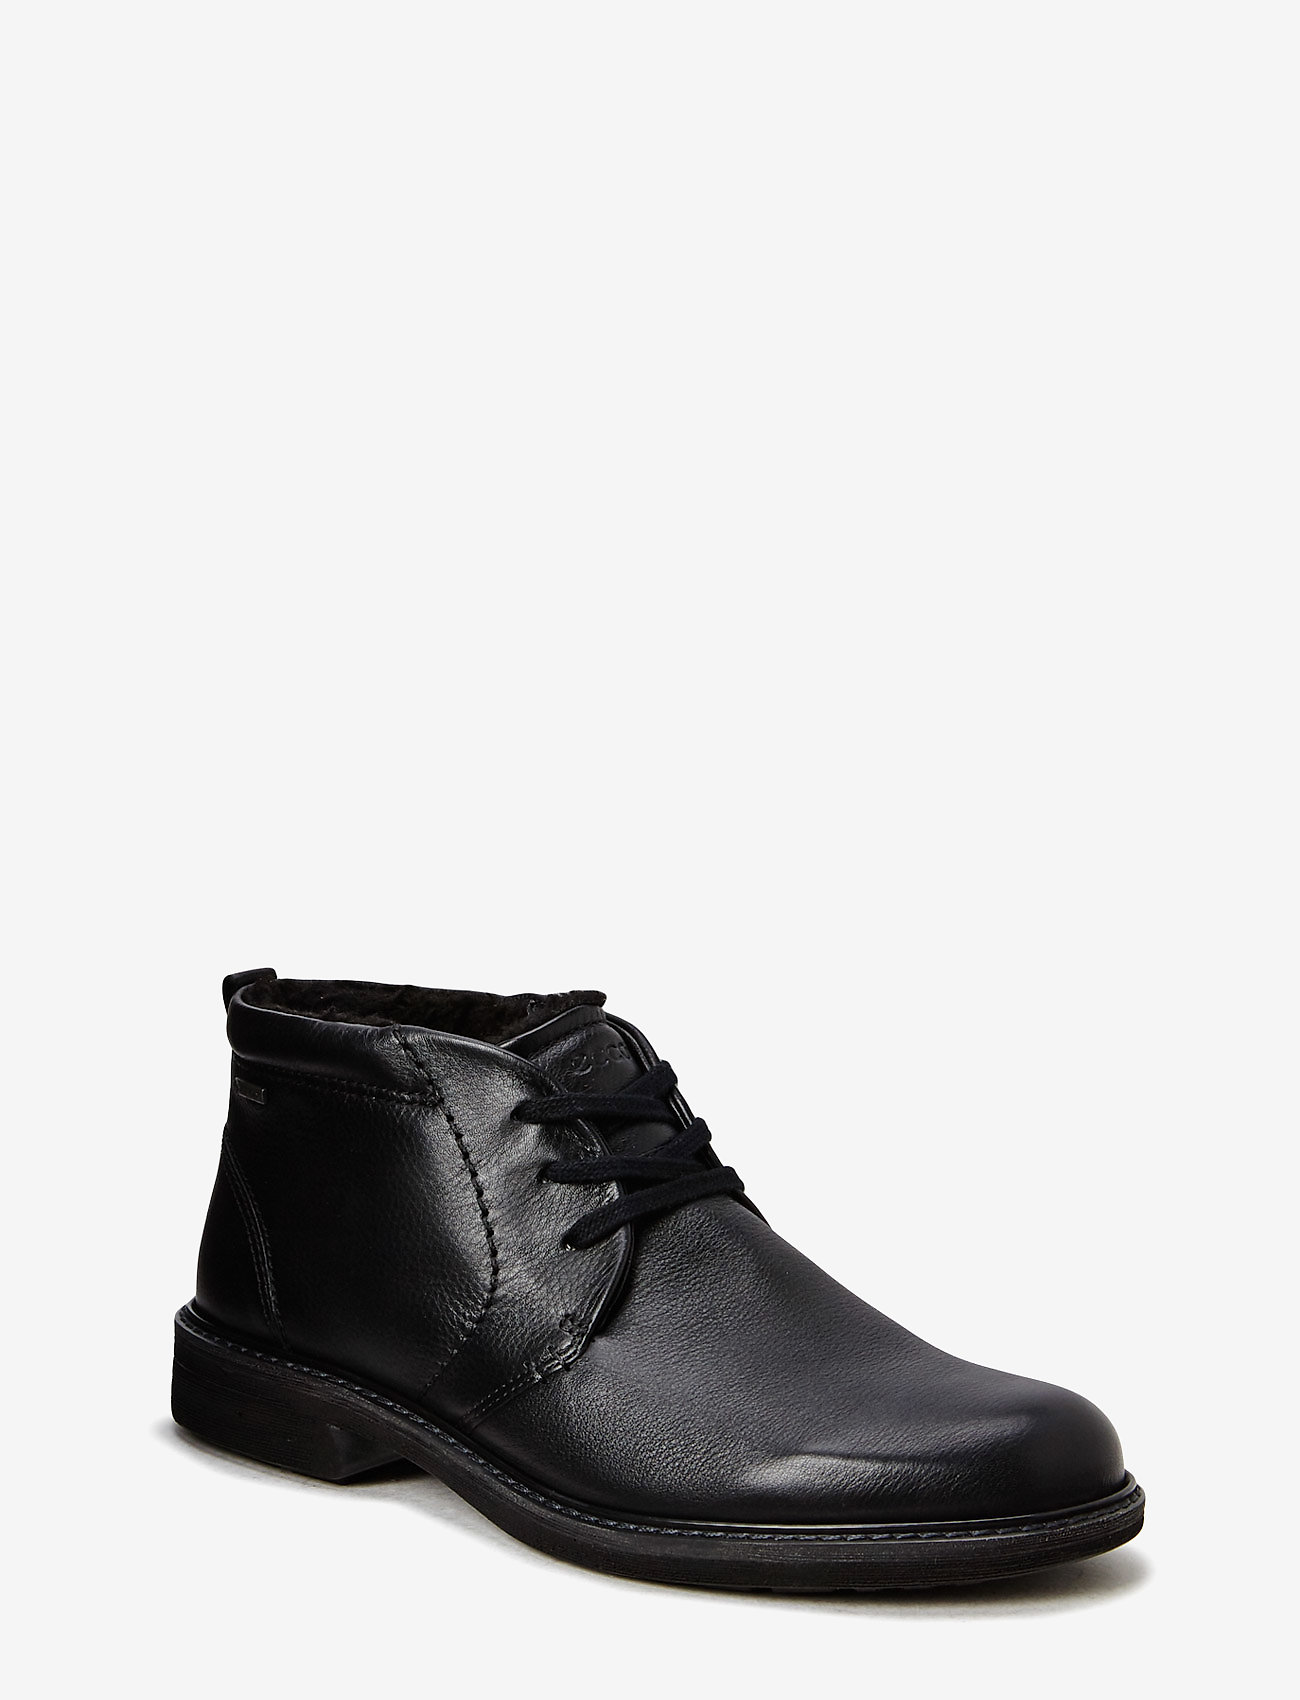 ECCO - TURN - desert boots - black - 0